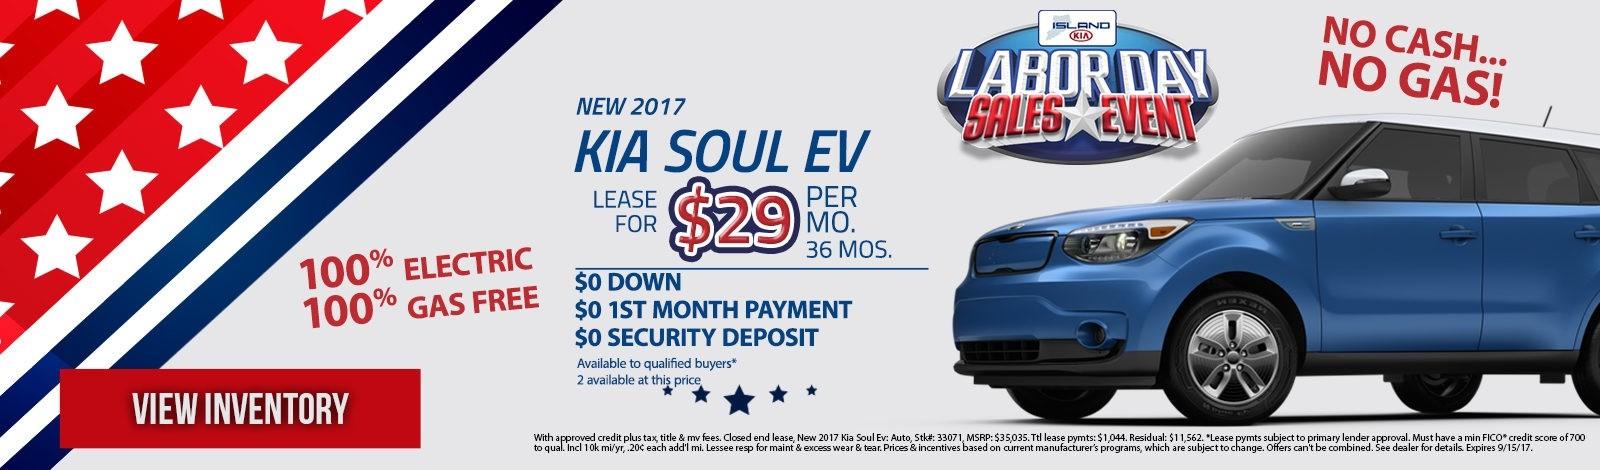 Island Kia Labor Specials_Soul Ev